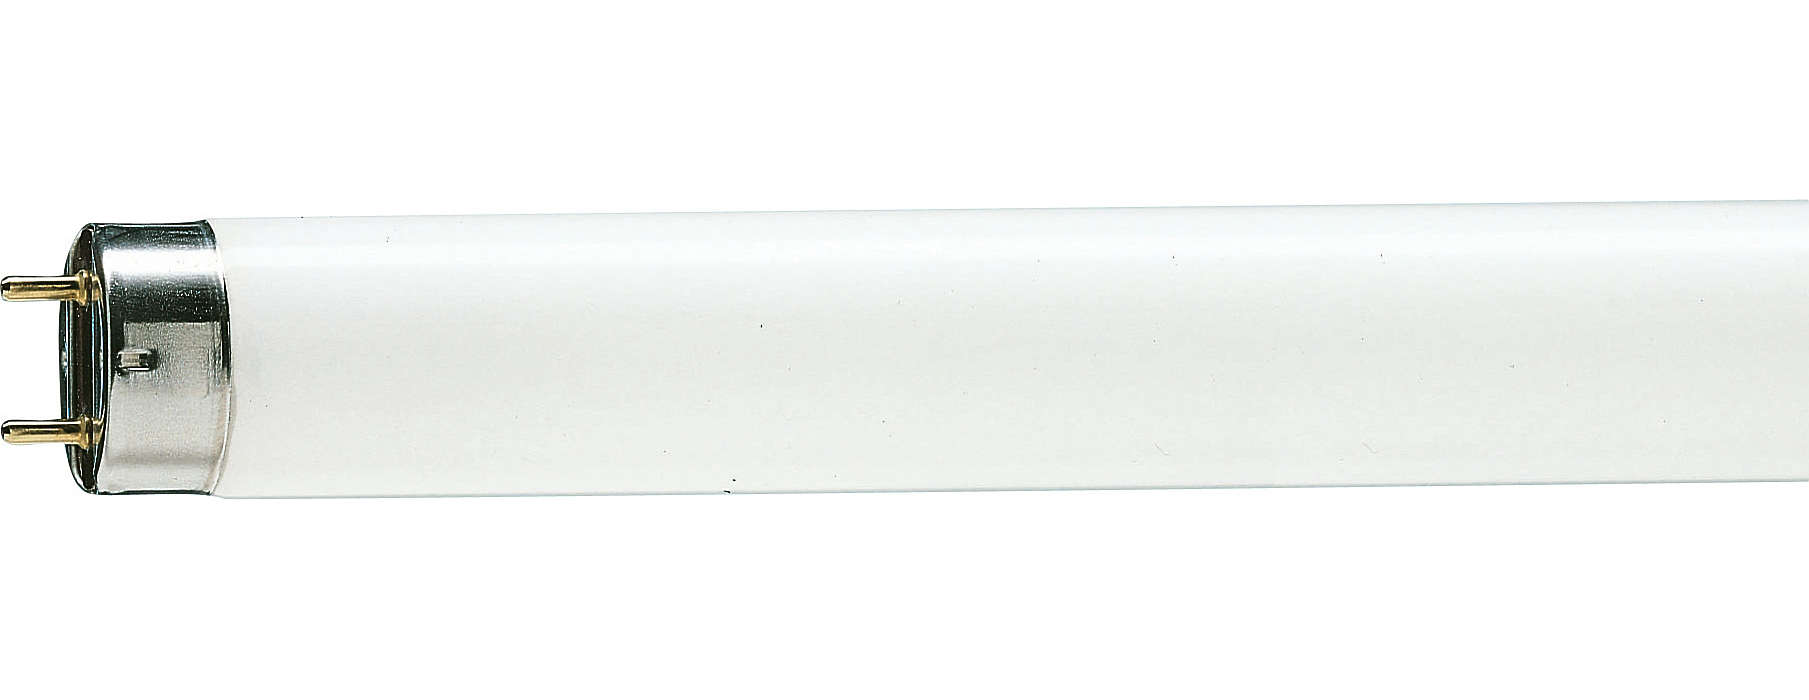 T8 900 Series Rapid Start